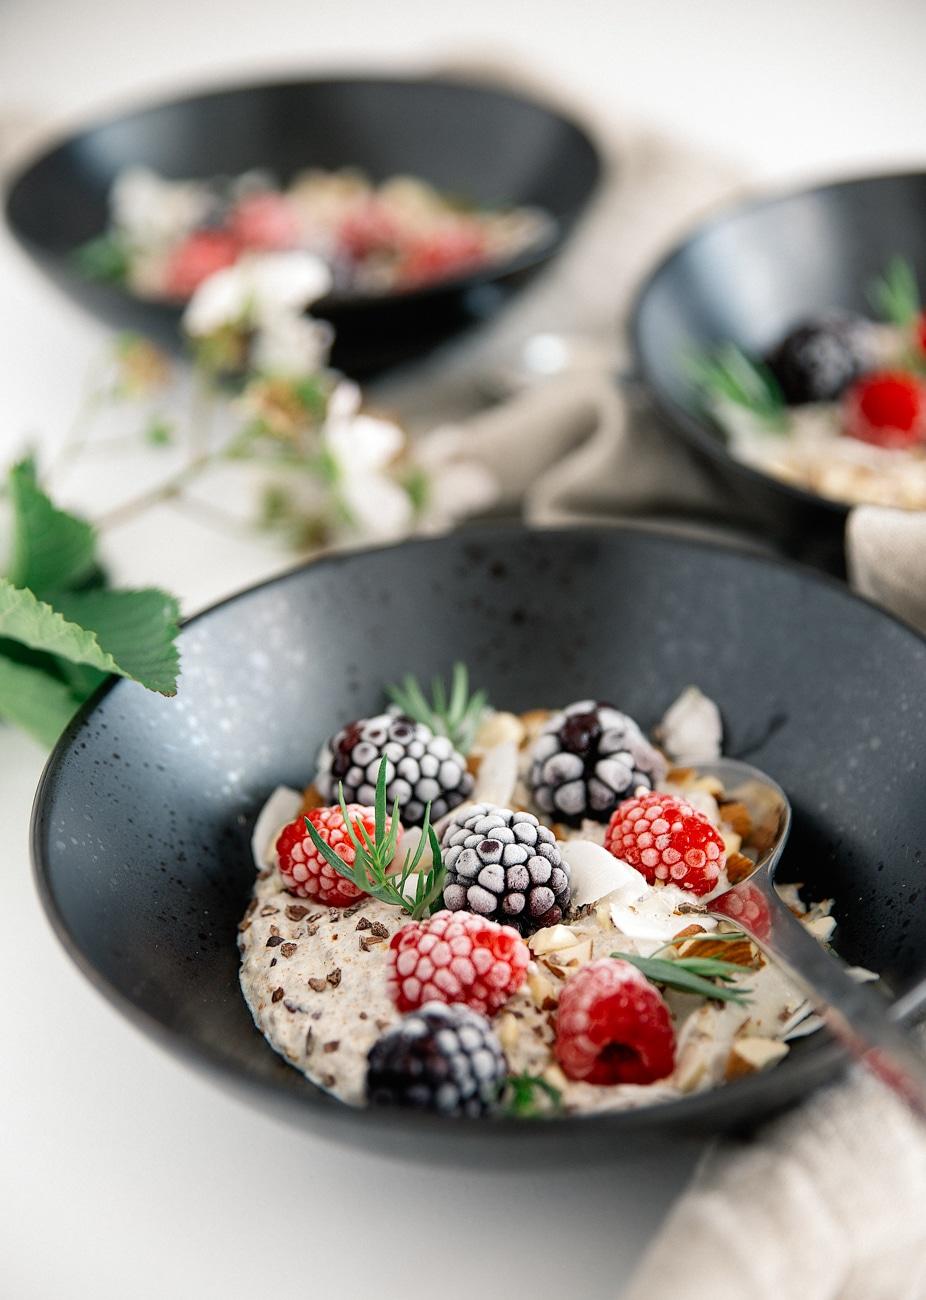 overnight chiagrød, køleskabsgrød, sund morgenmad, chiafrø